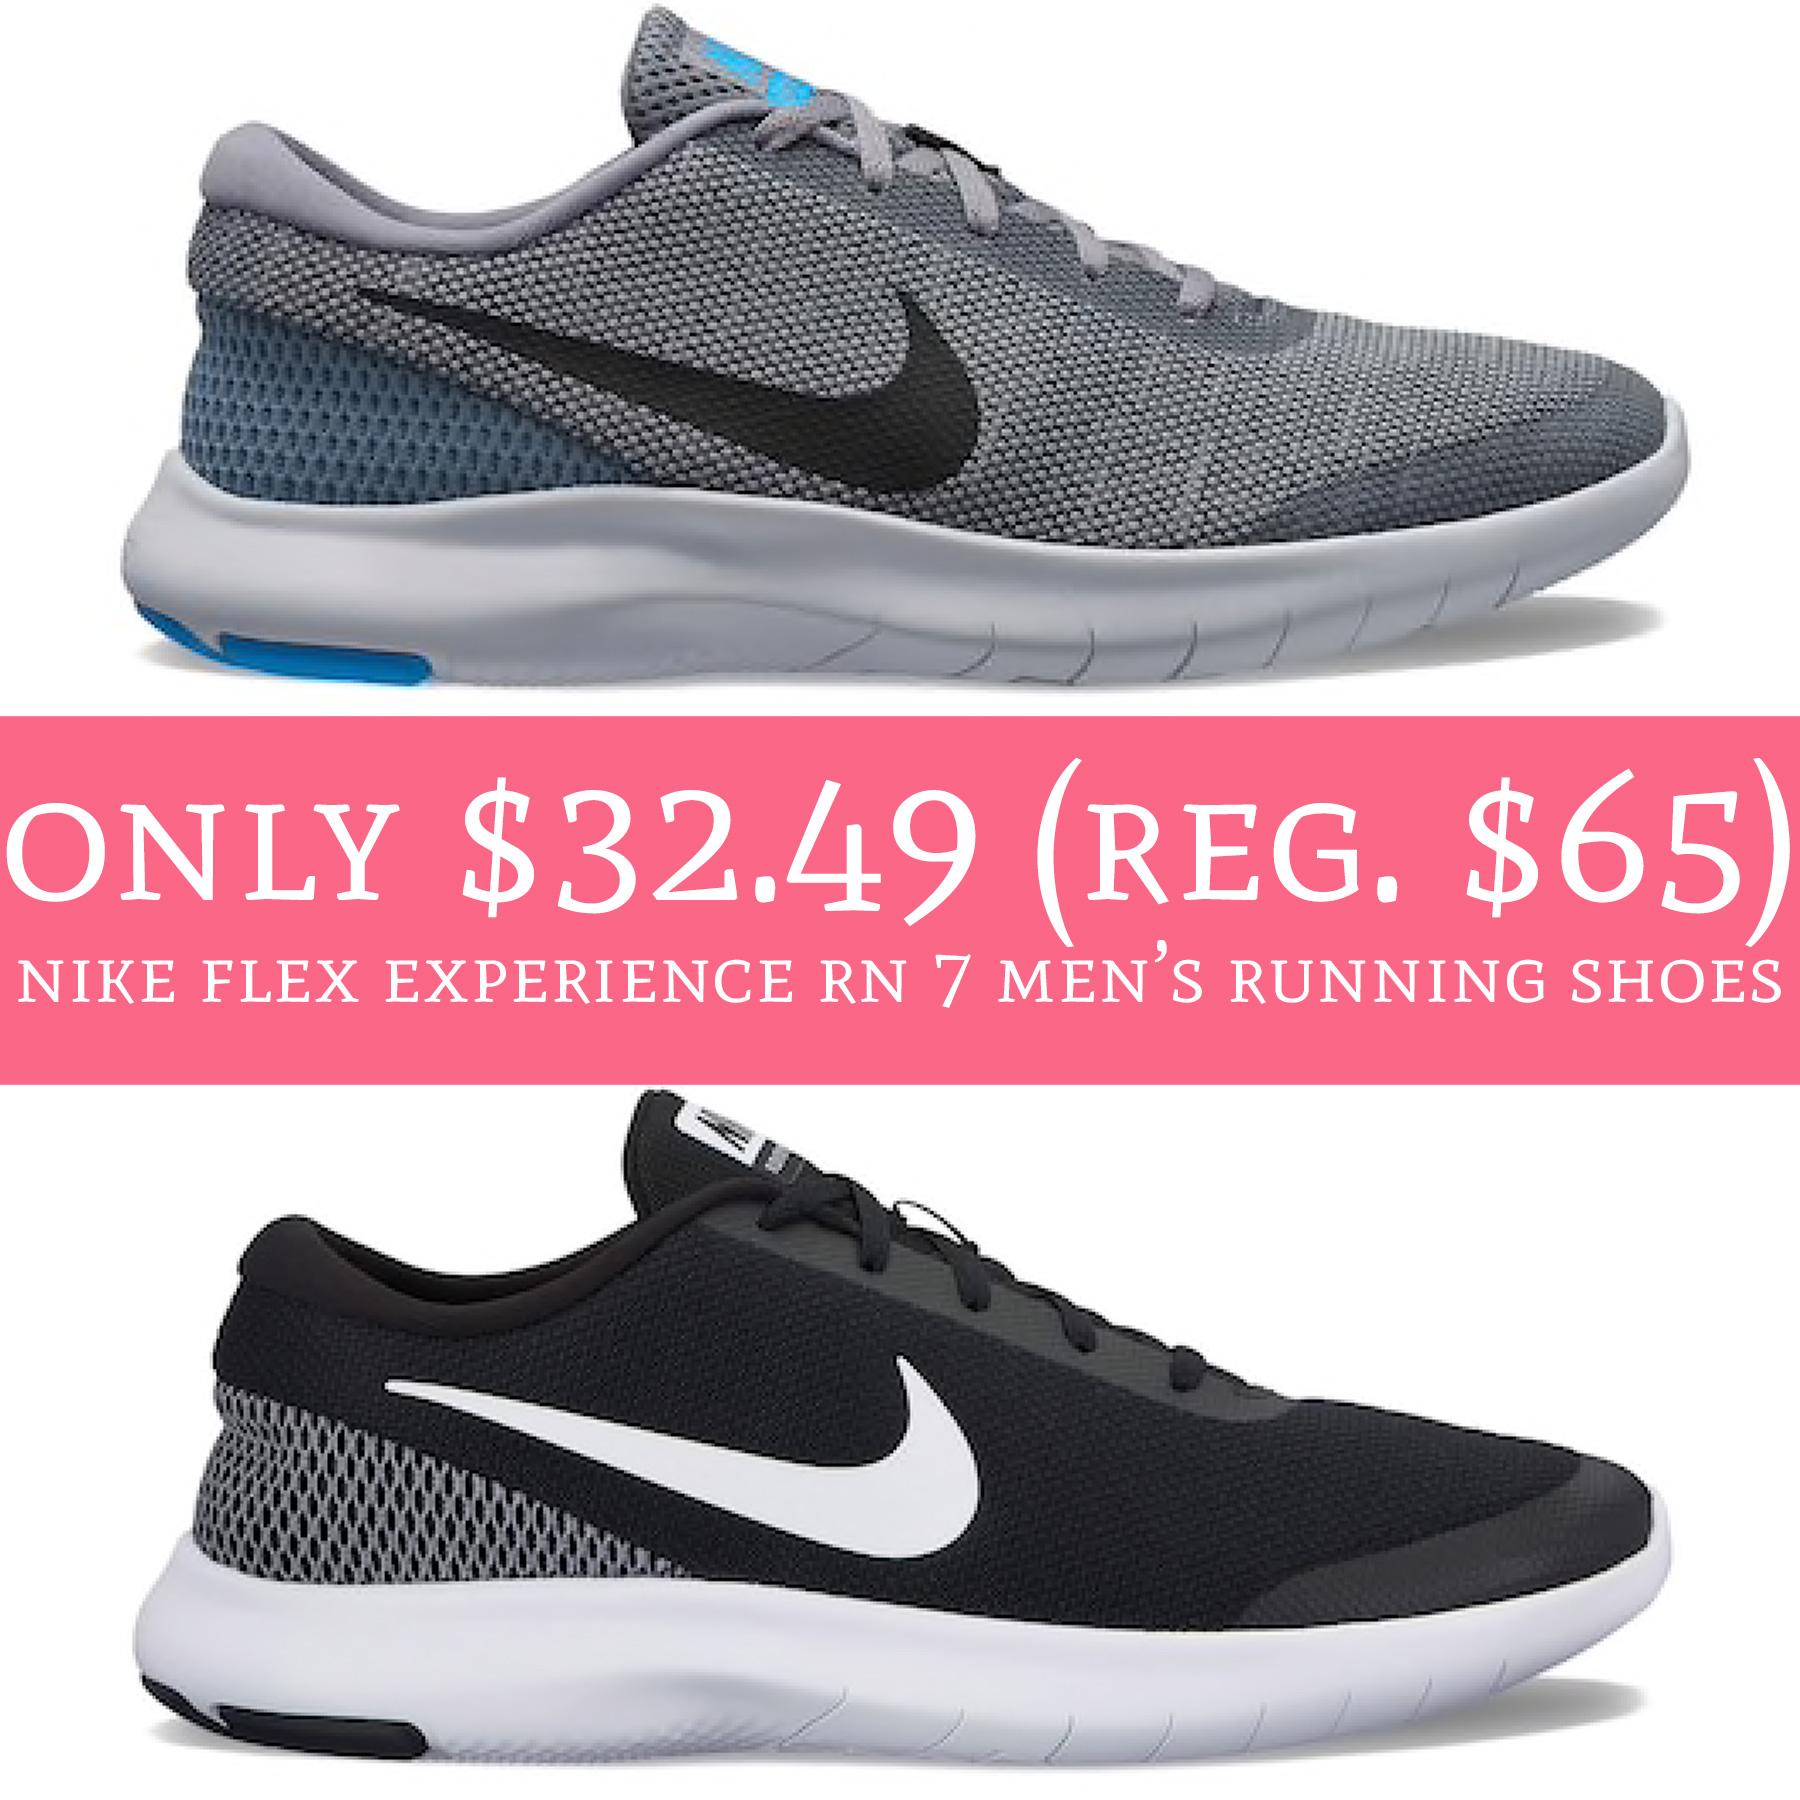 Only $32.49 (Regular $65) Nike Flex